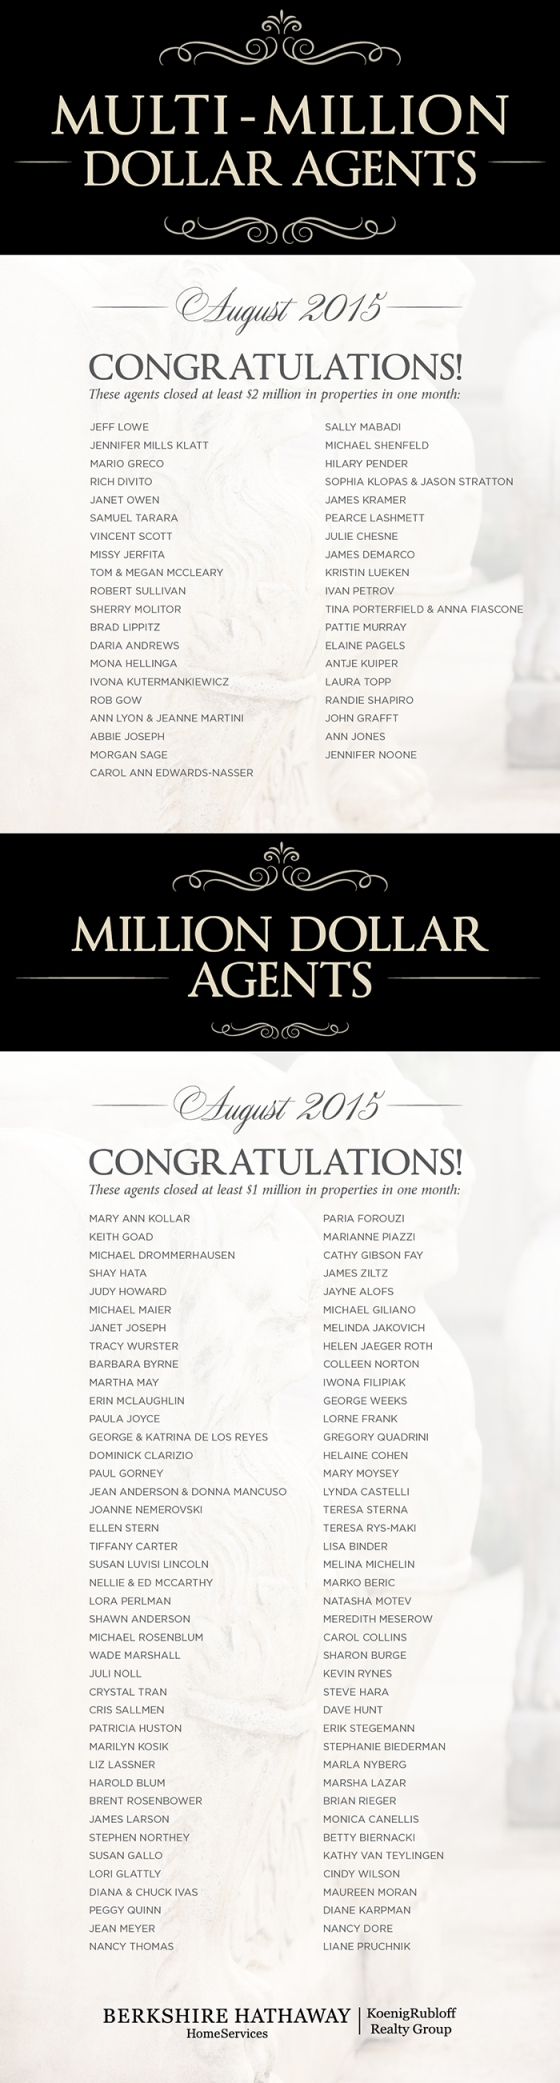 August 2015 Millionaires & Multi-Millionaire